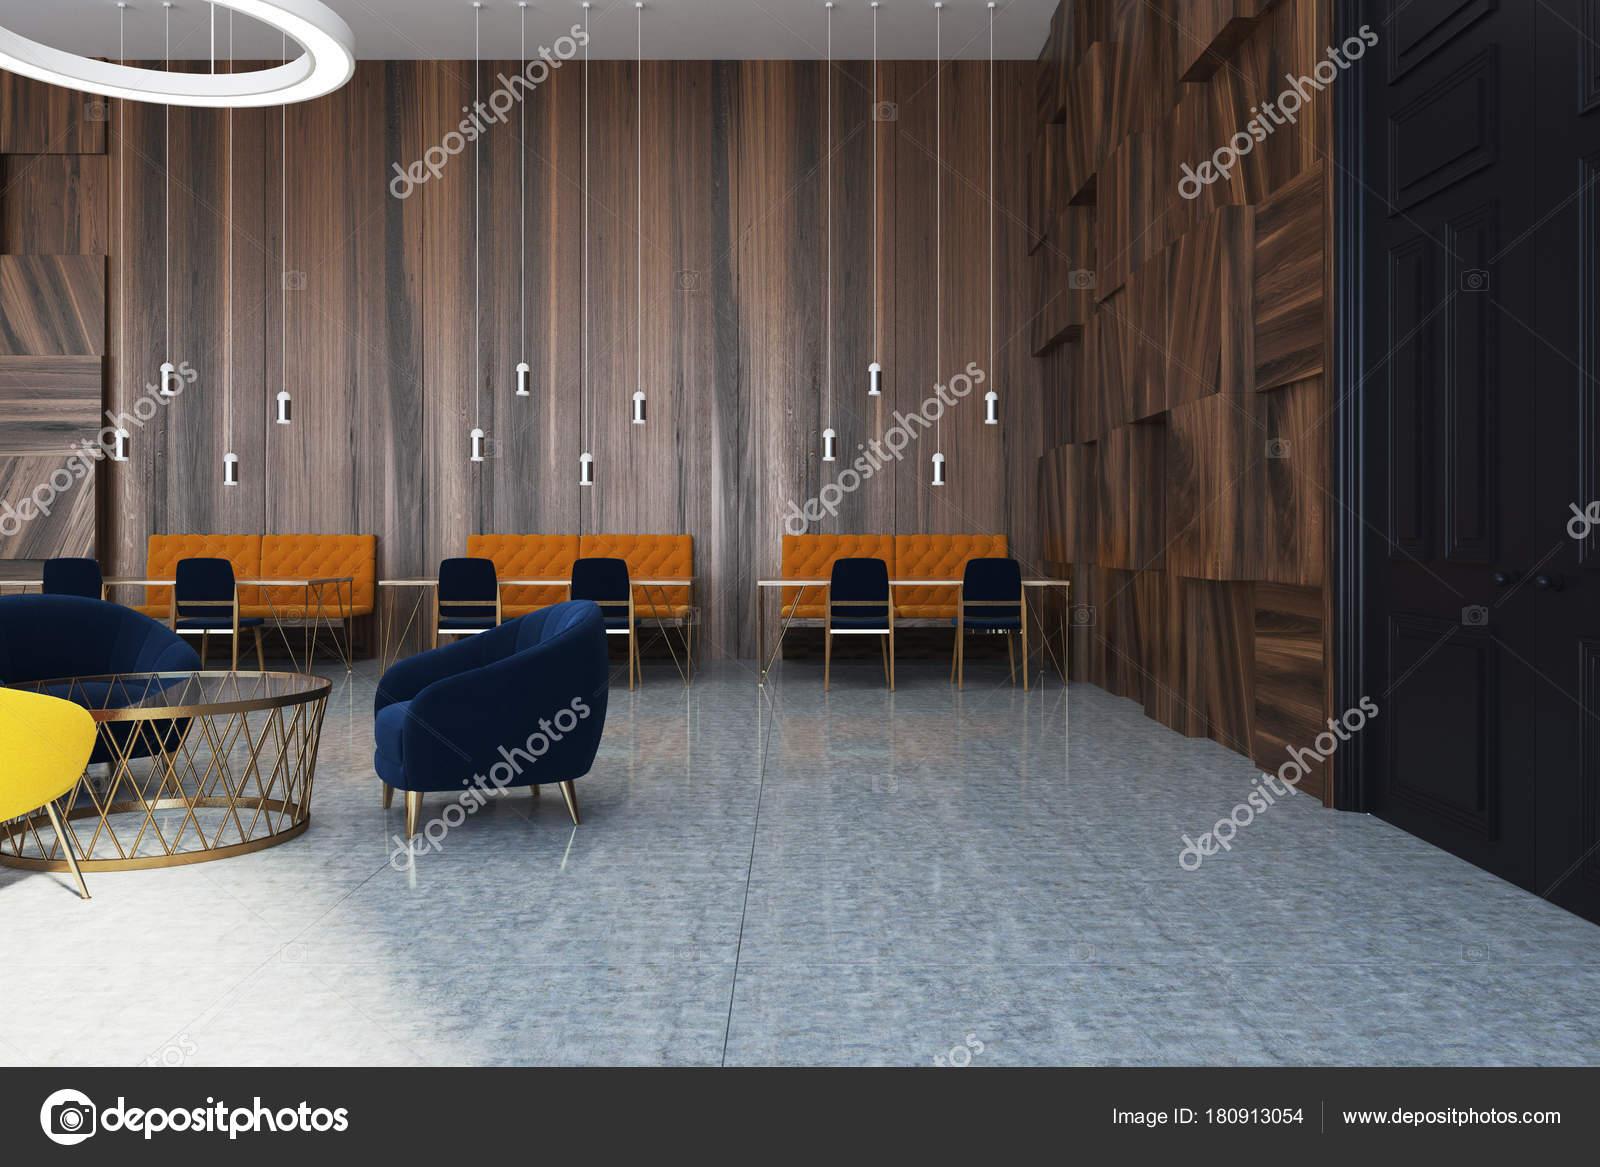 Wooden Modern Office Waiting Room Stock Photo C Denisismagilov 180913054